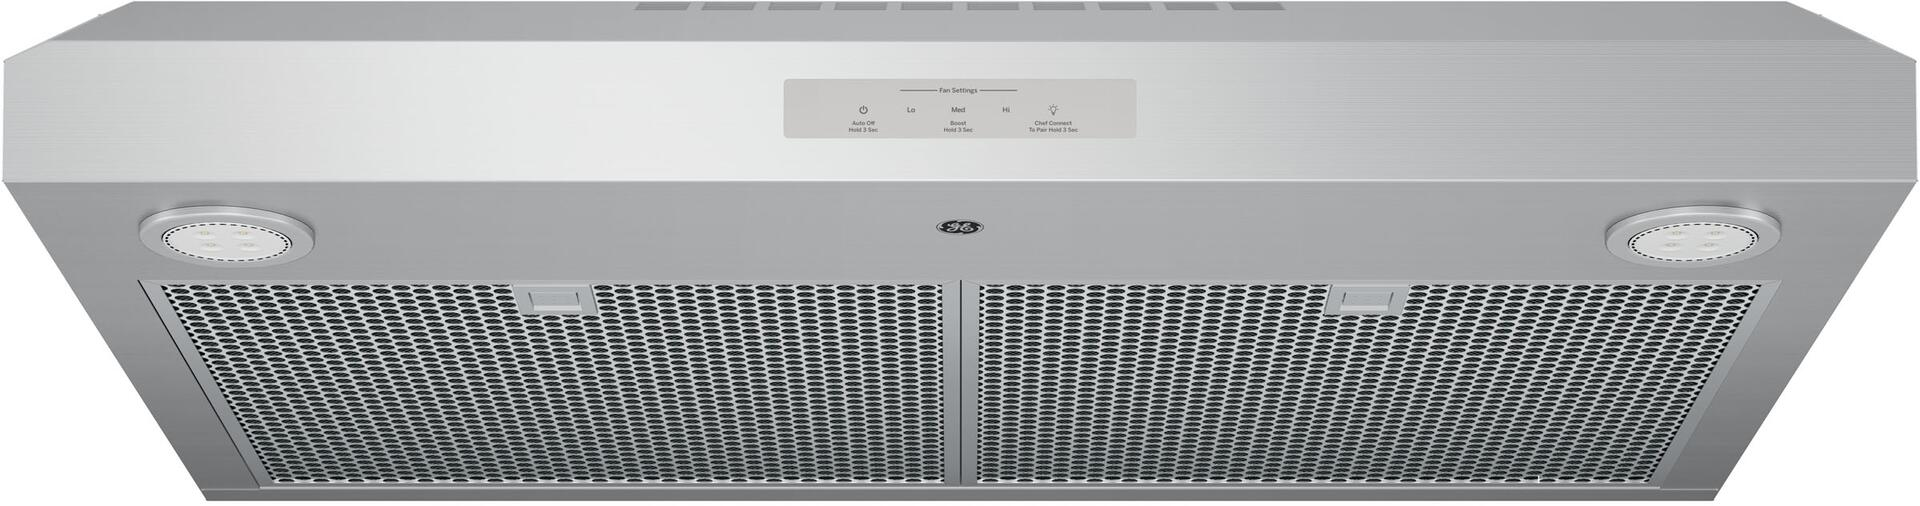 Ge Profile Pvx7300sjss Appliances Connection